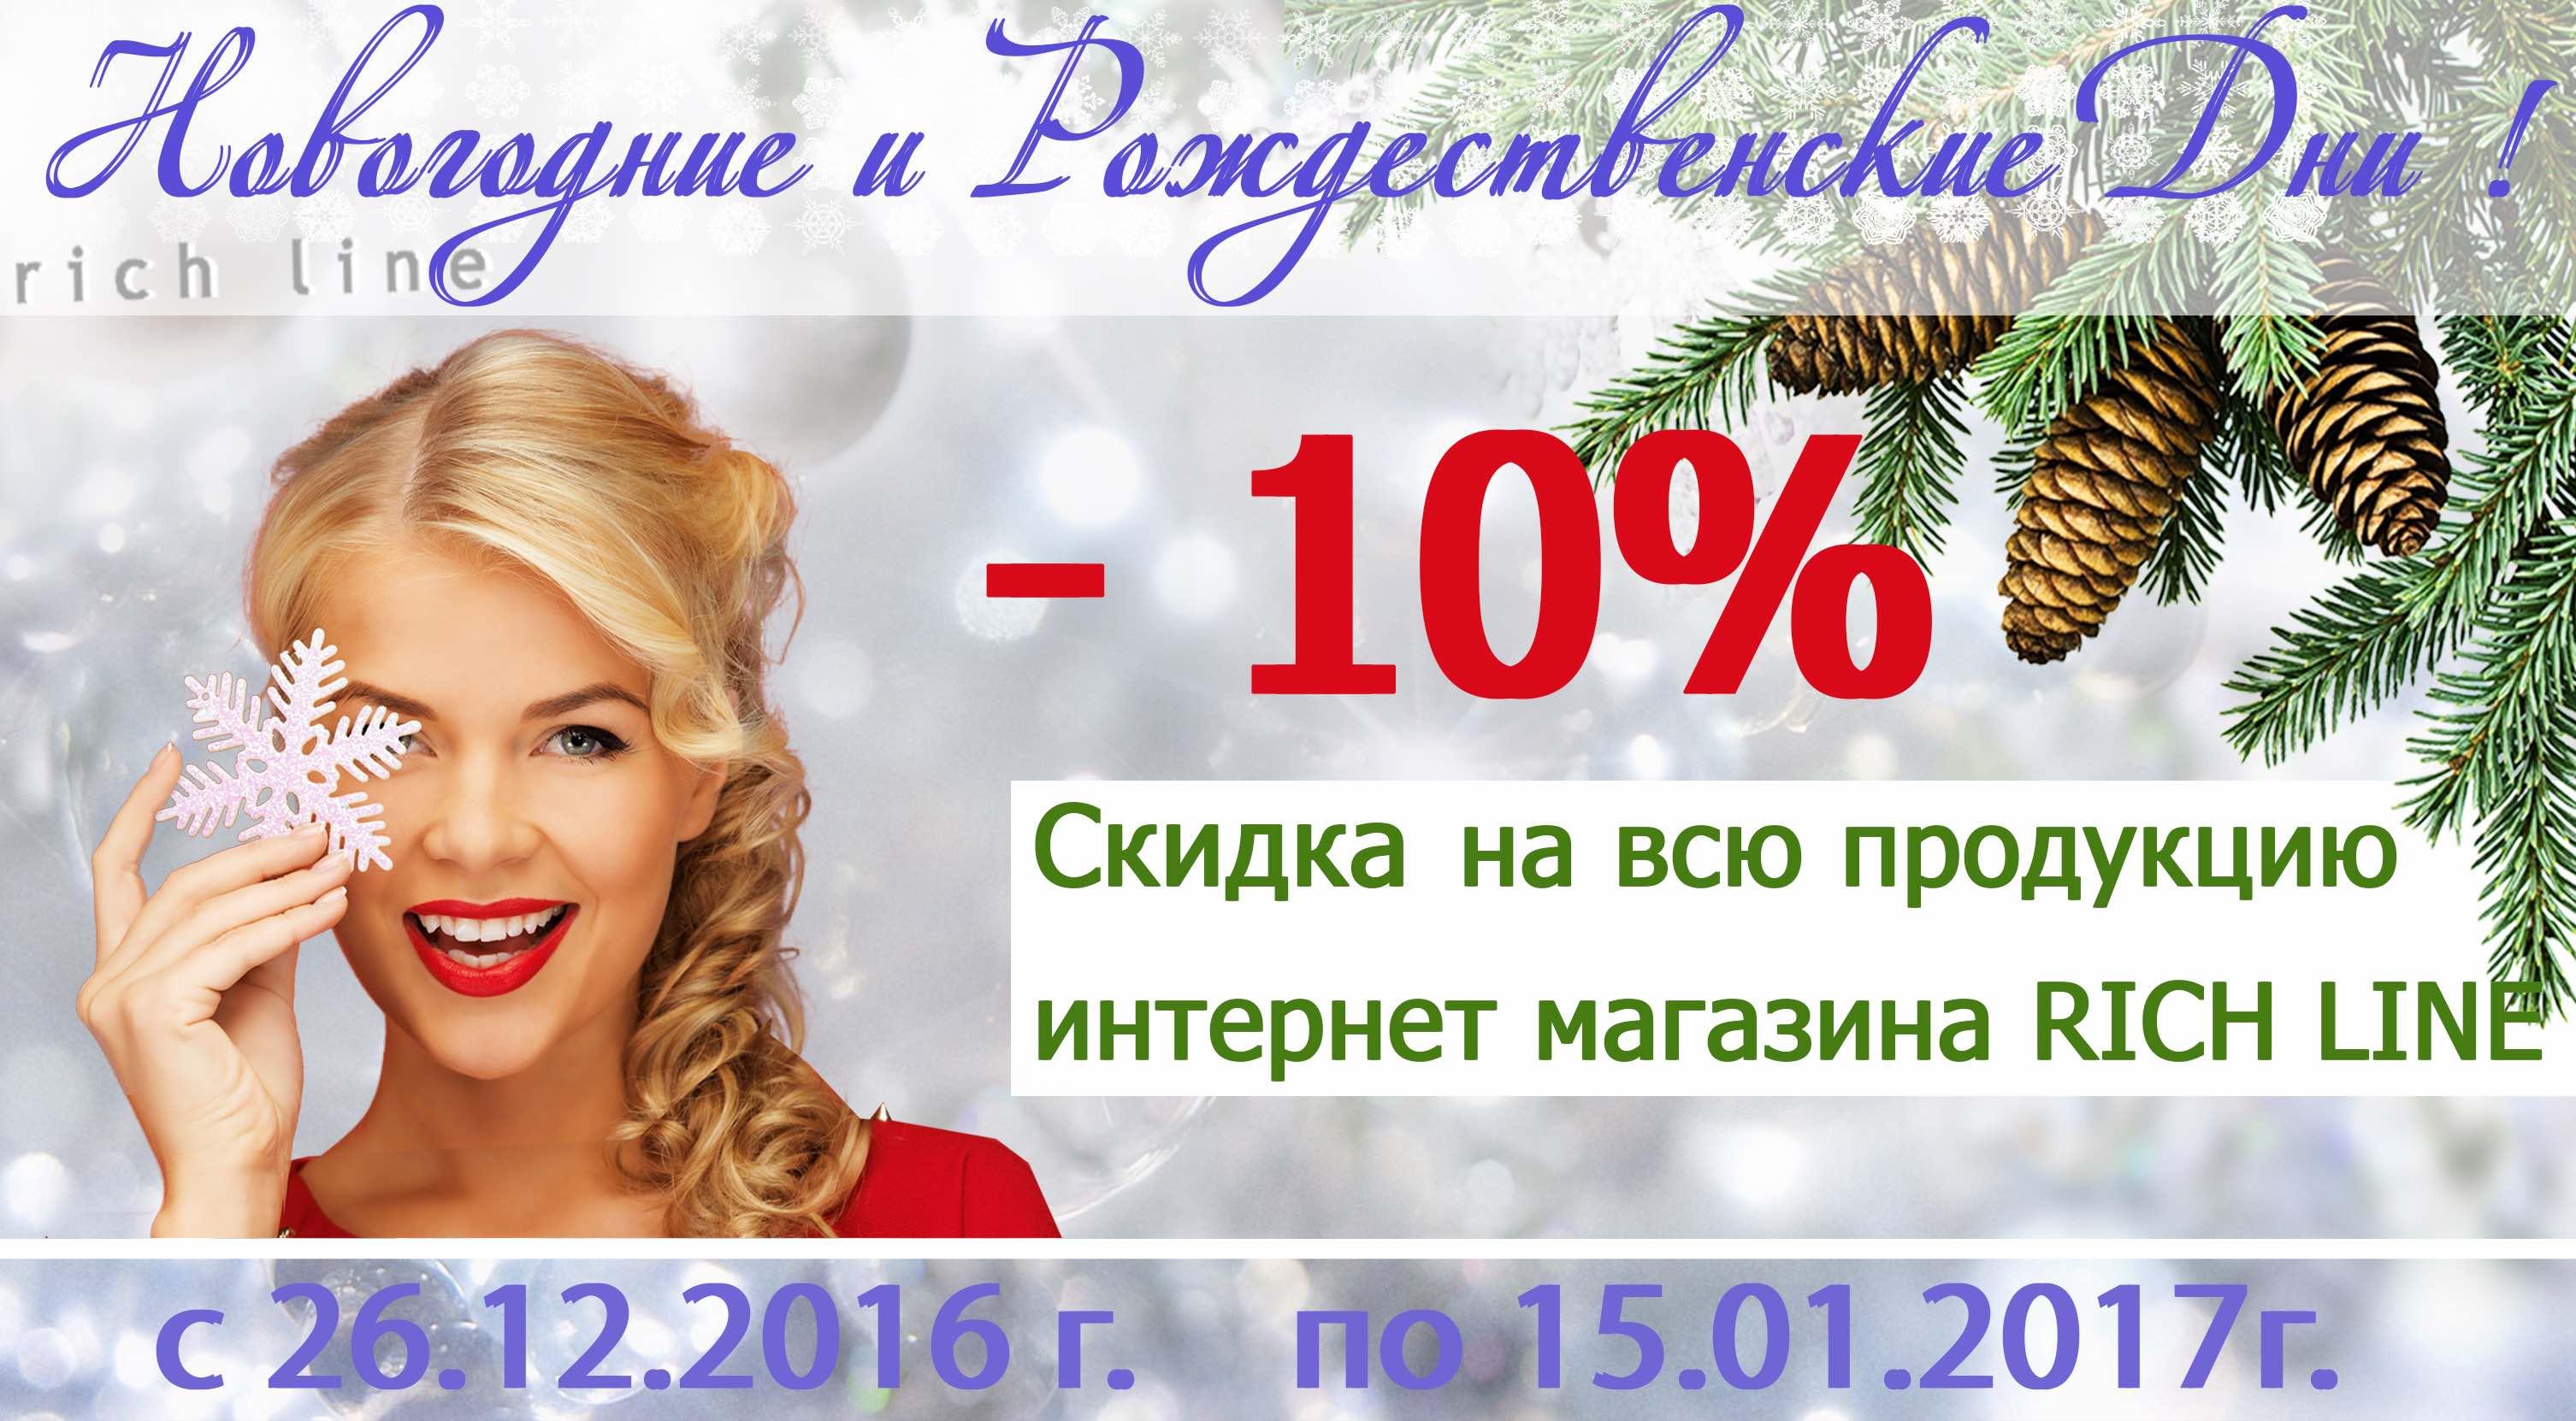 malyj-baner-akciya-dekabr